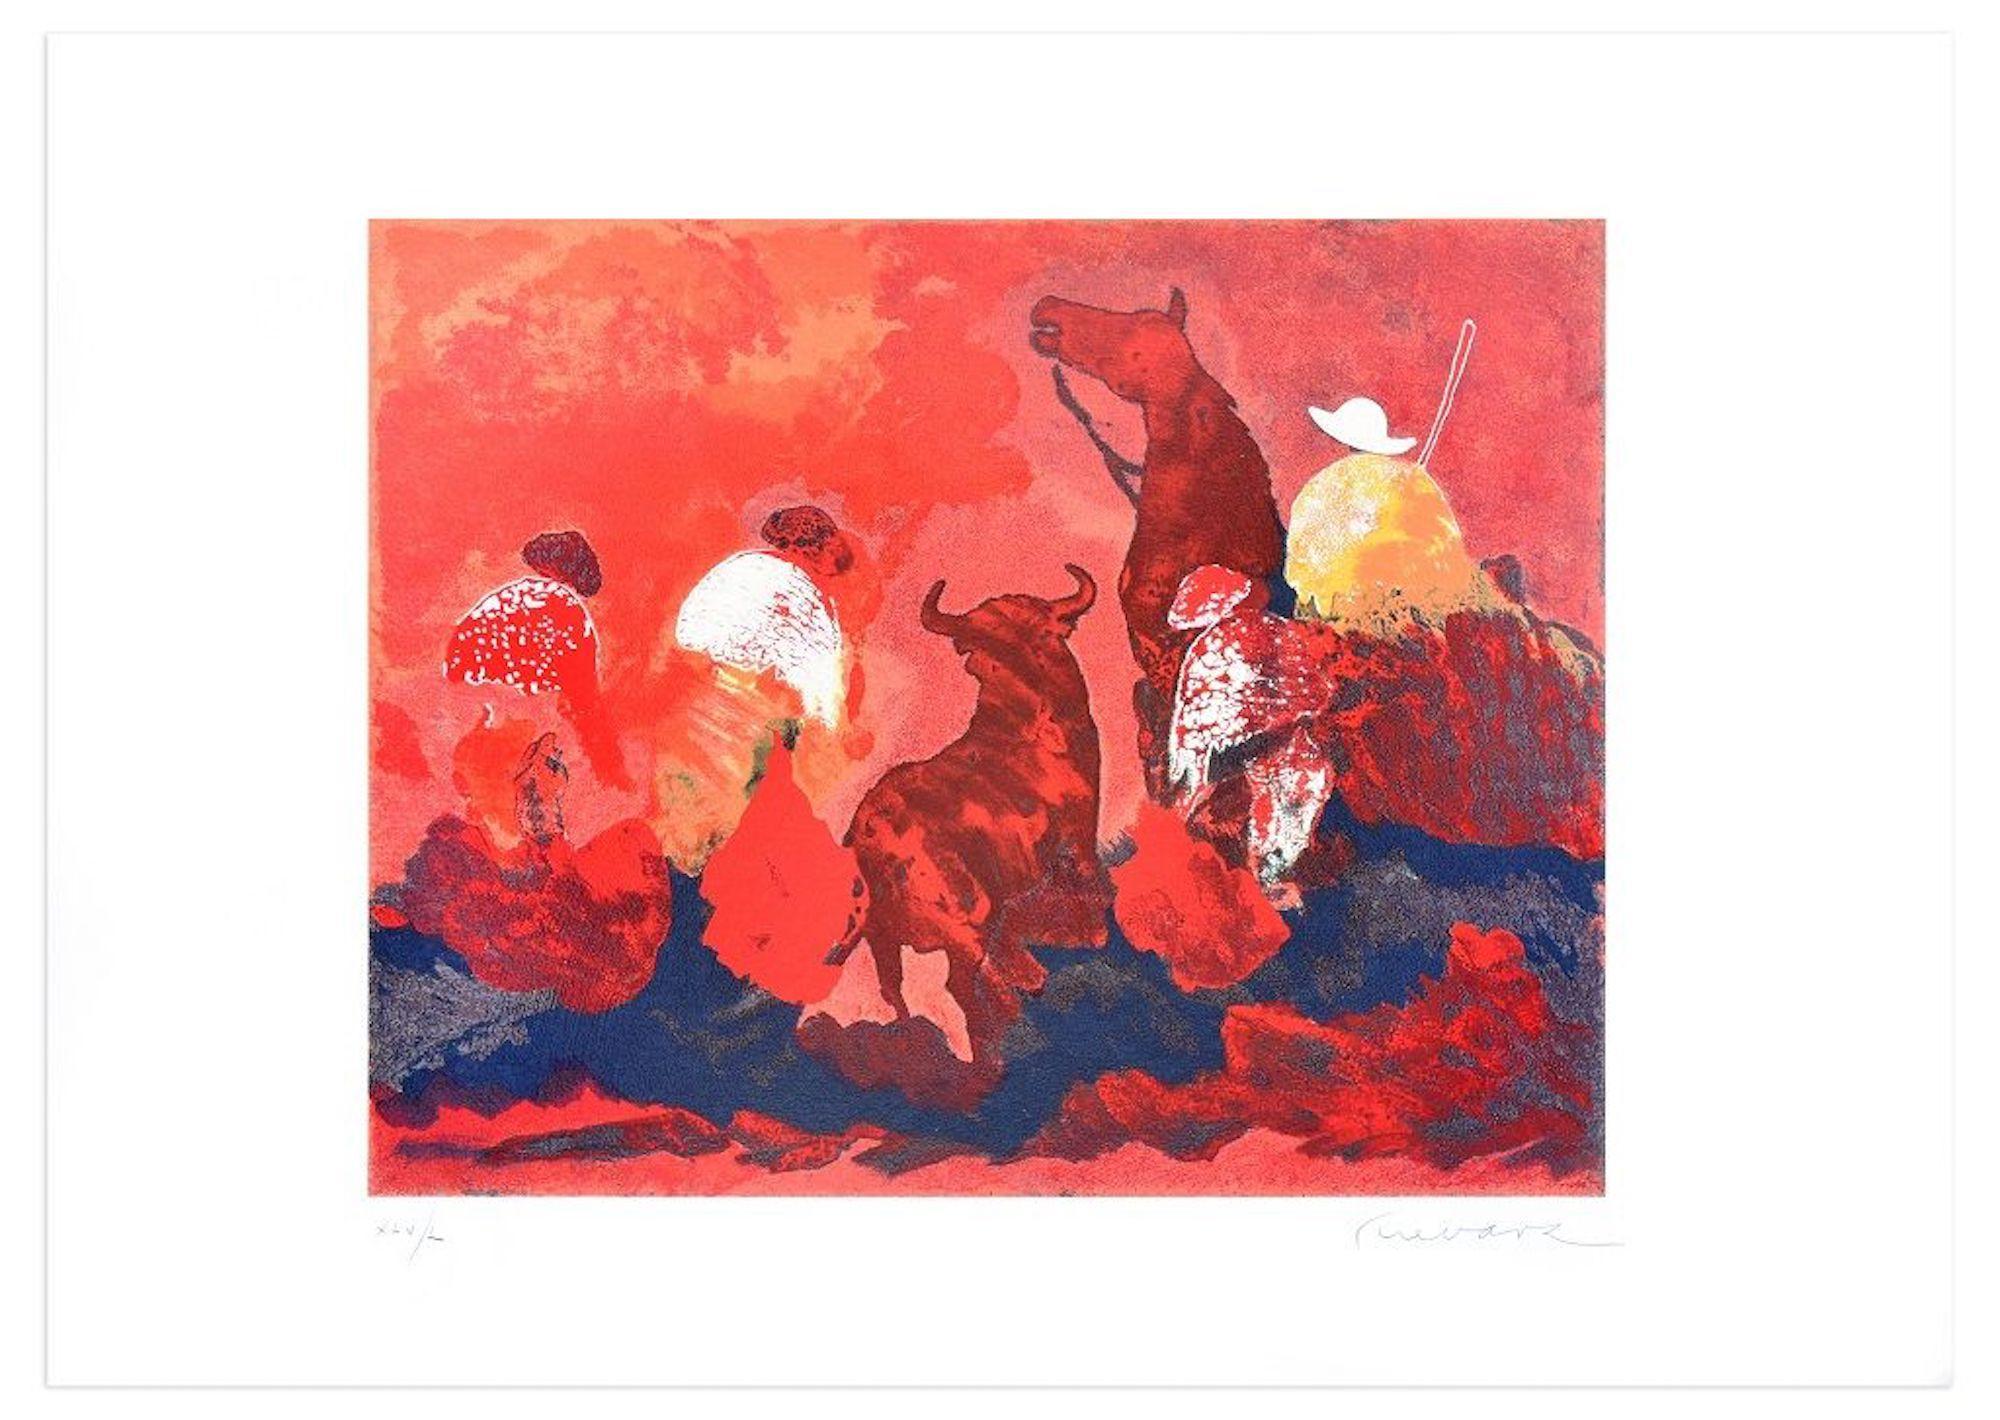 Bullfight in Red - Original Screen Print by José Guevara - 1989